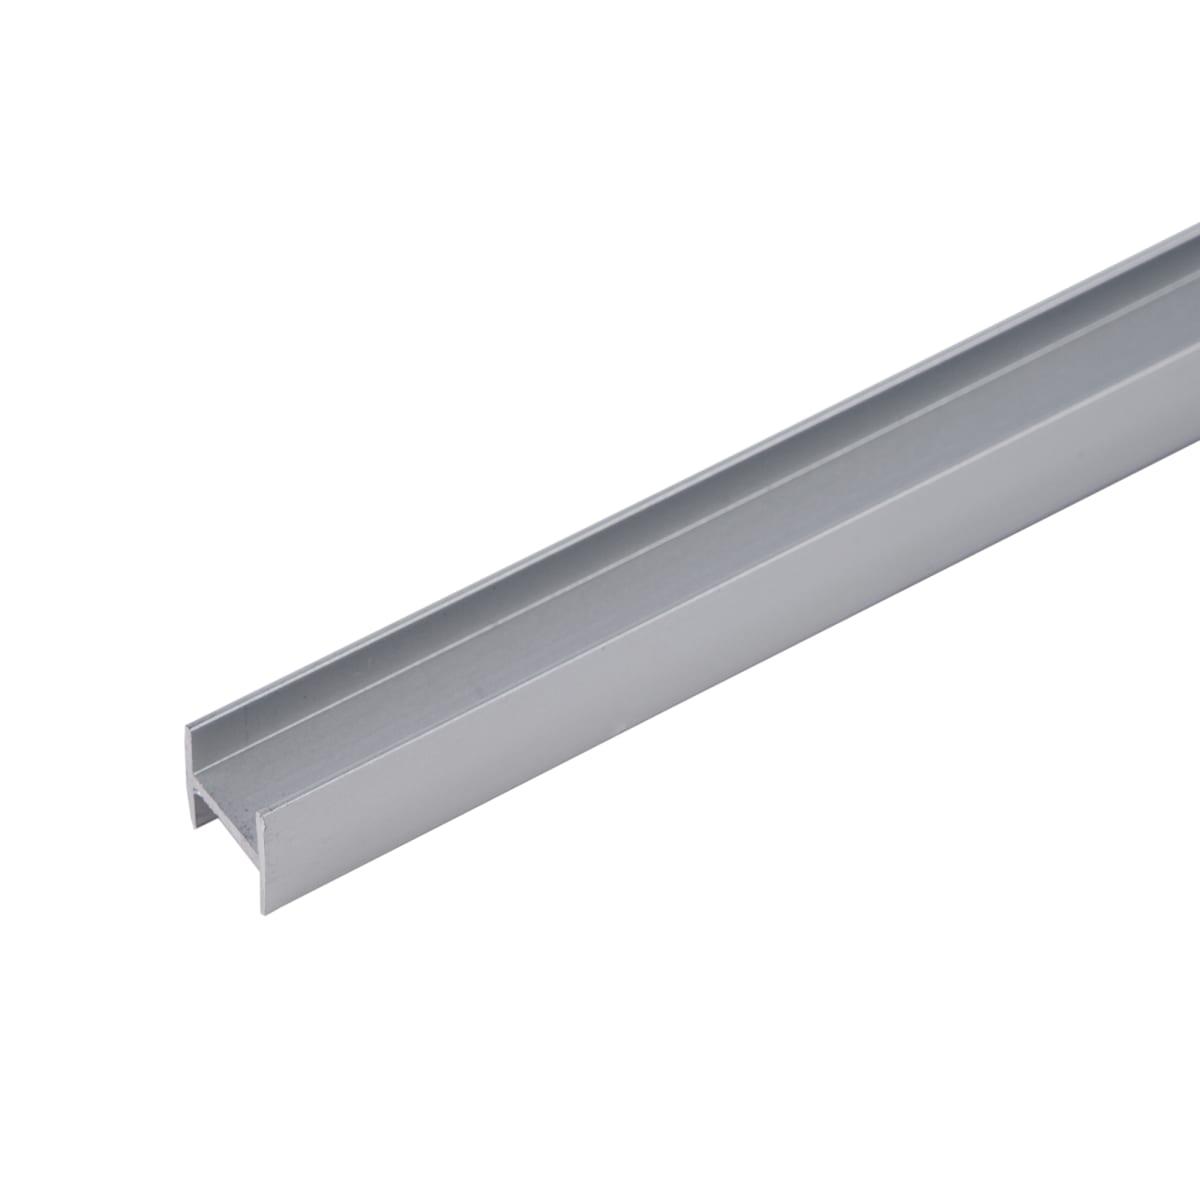 H-профиль 6мм RAL9006